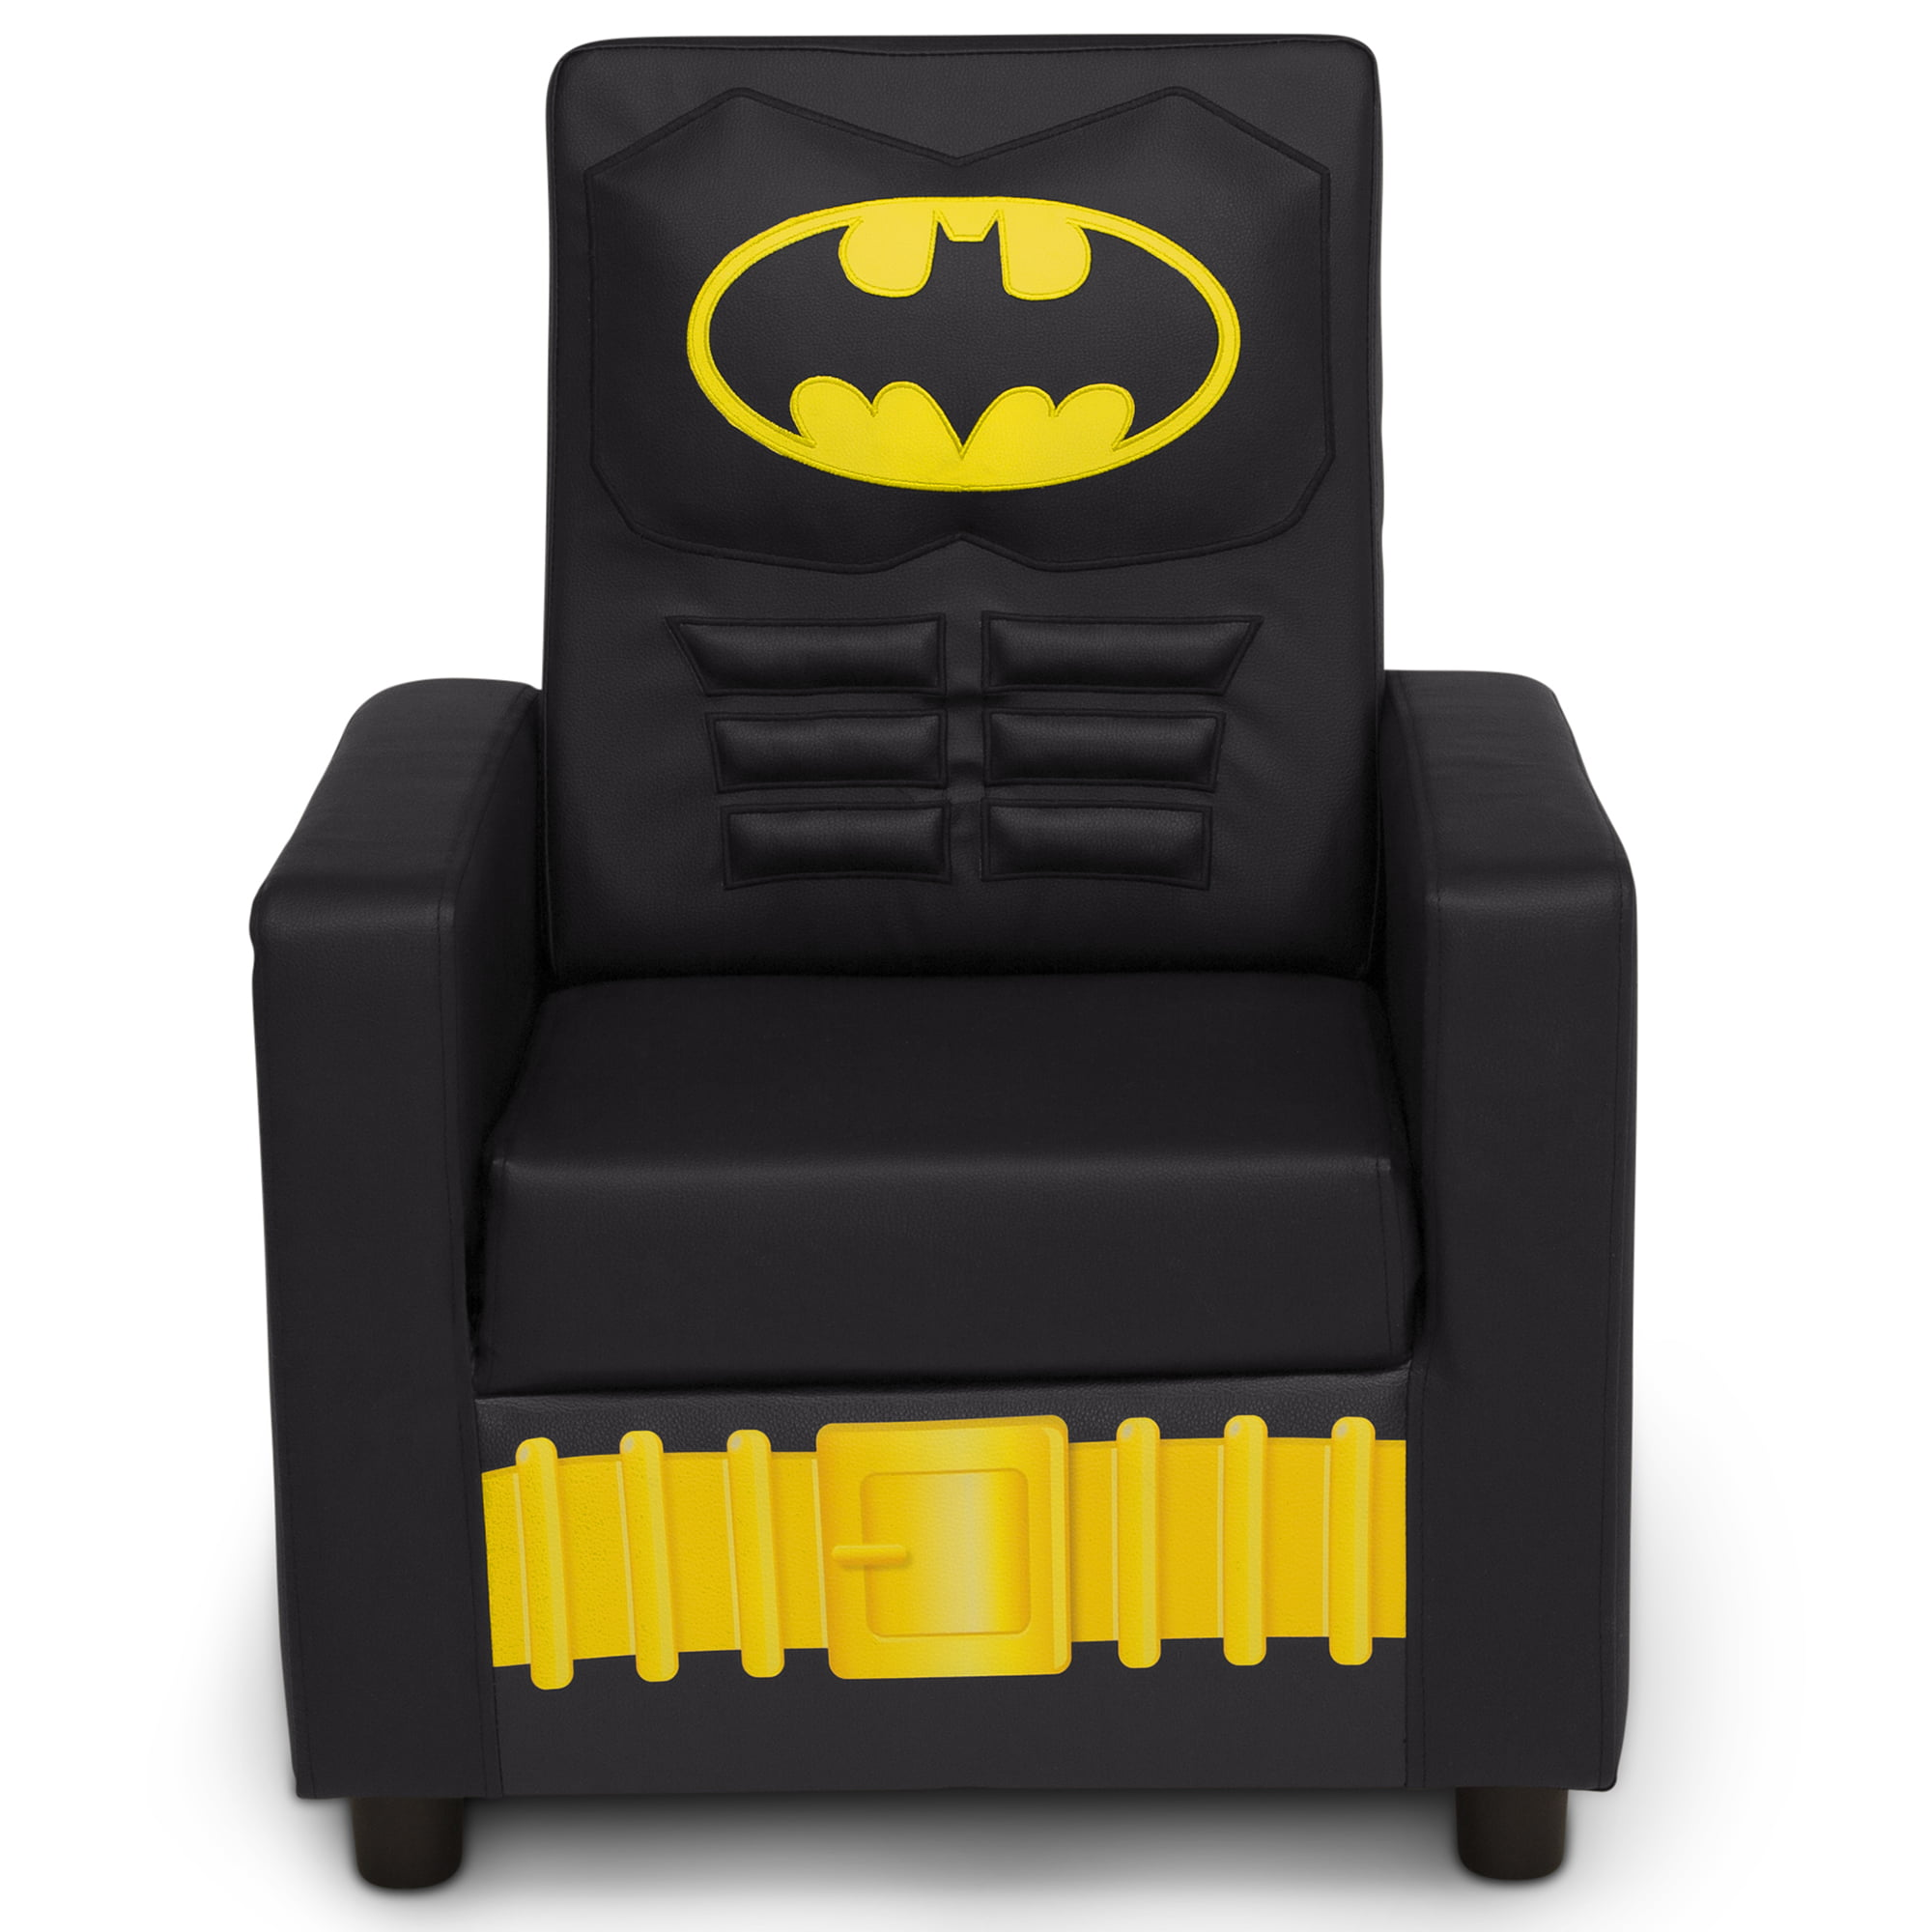 Dc Comics Batman Youth High Back Upholstered Chair By Delta Children Walmart Com Walmart Com